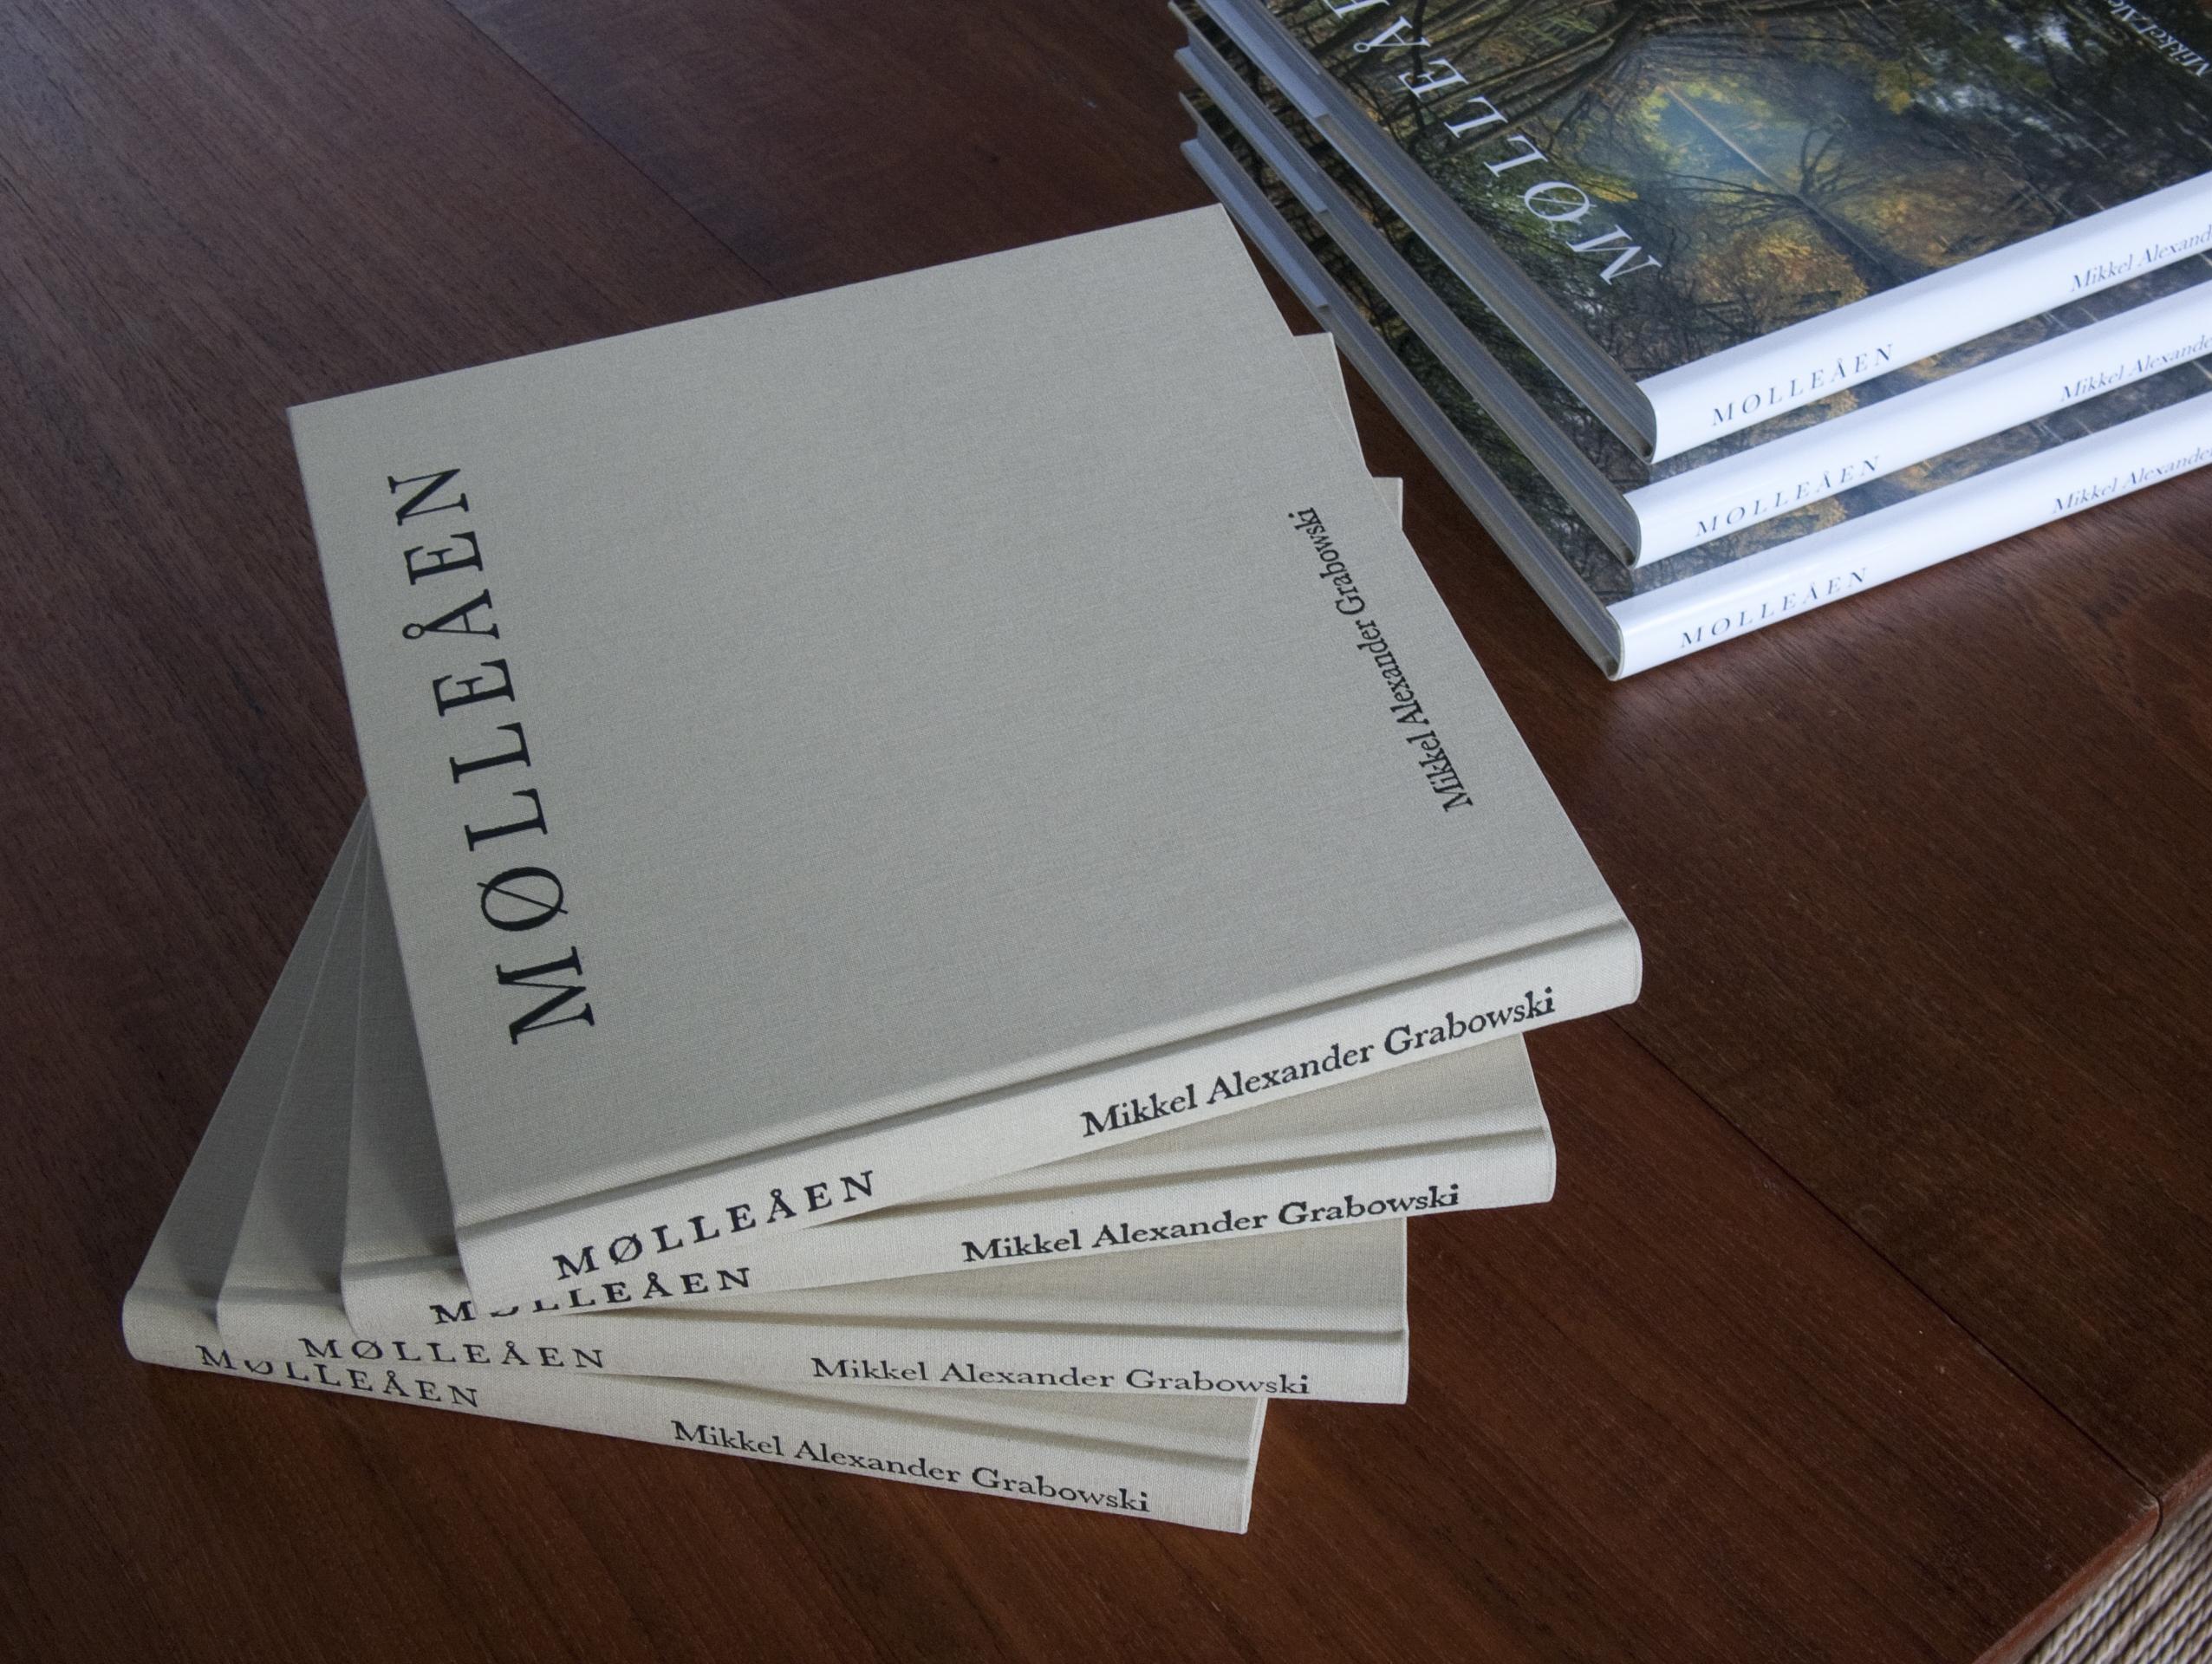 Mikkel Alexander Grabowski's book about Mølleåen